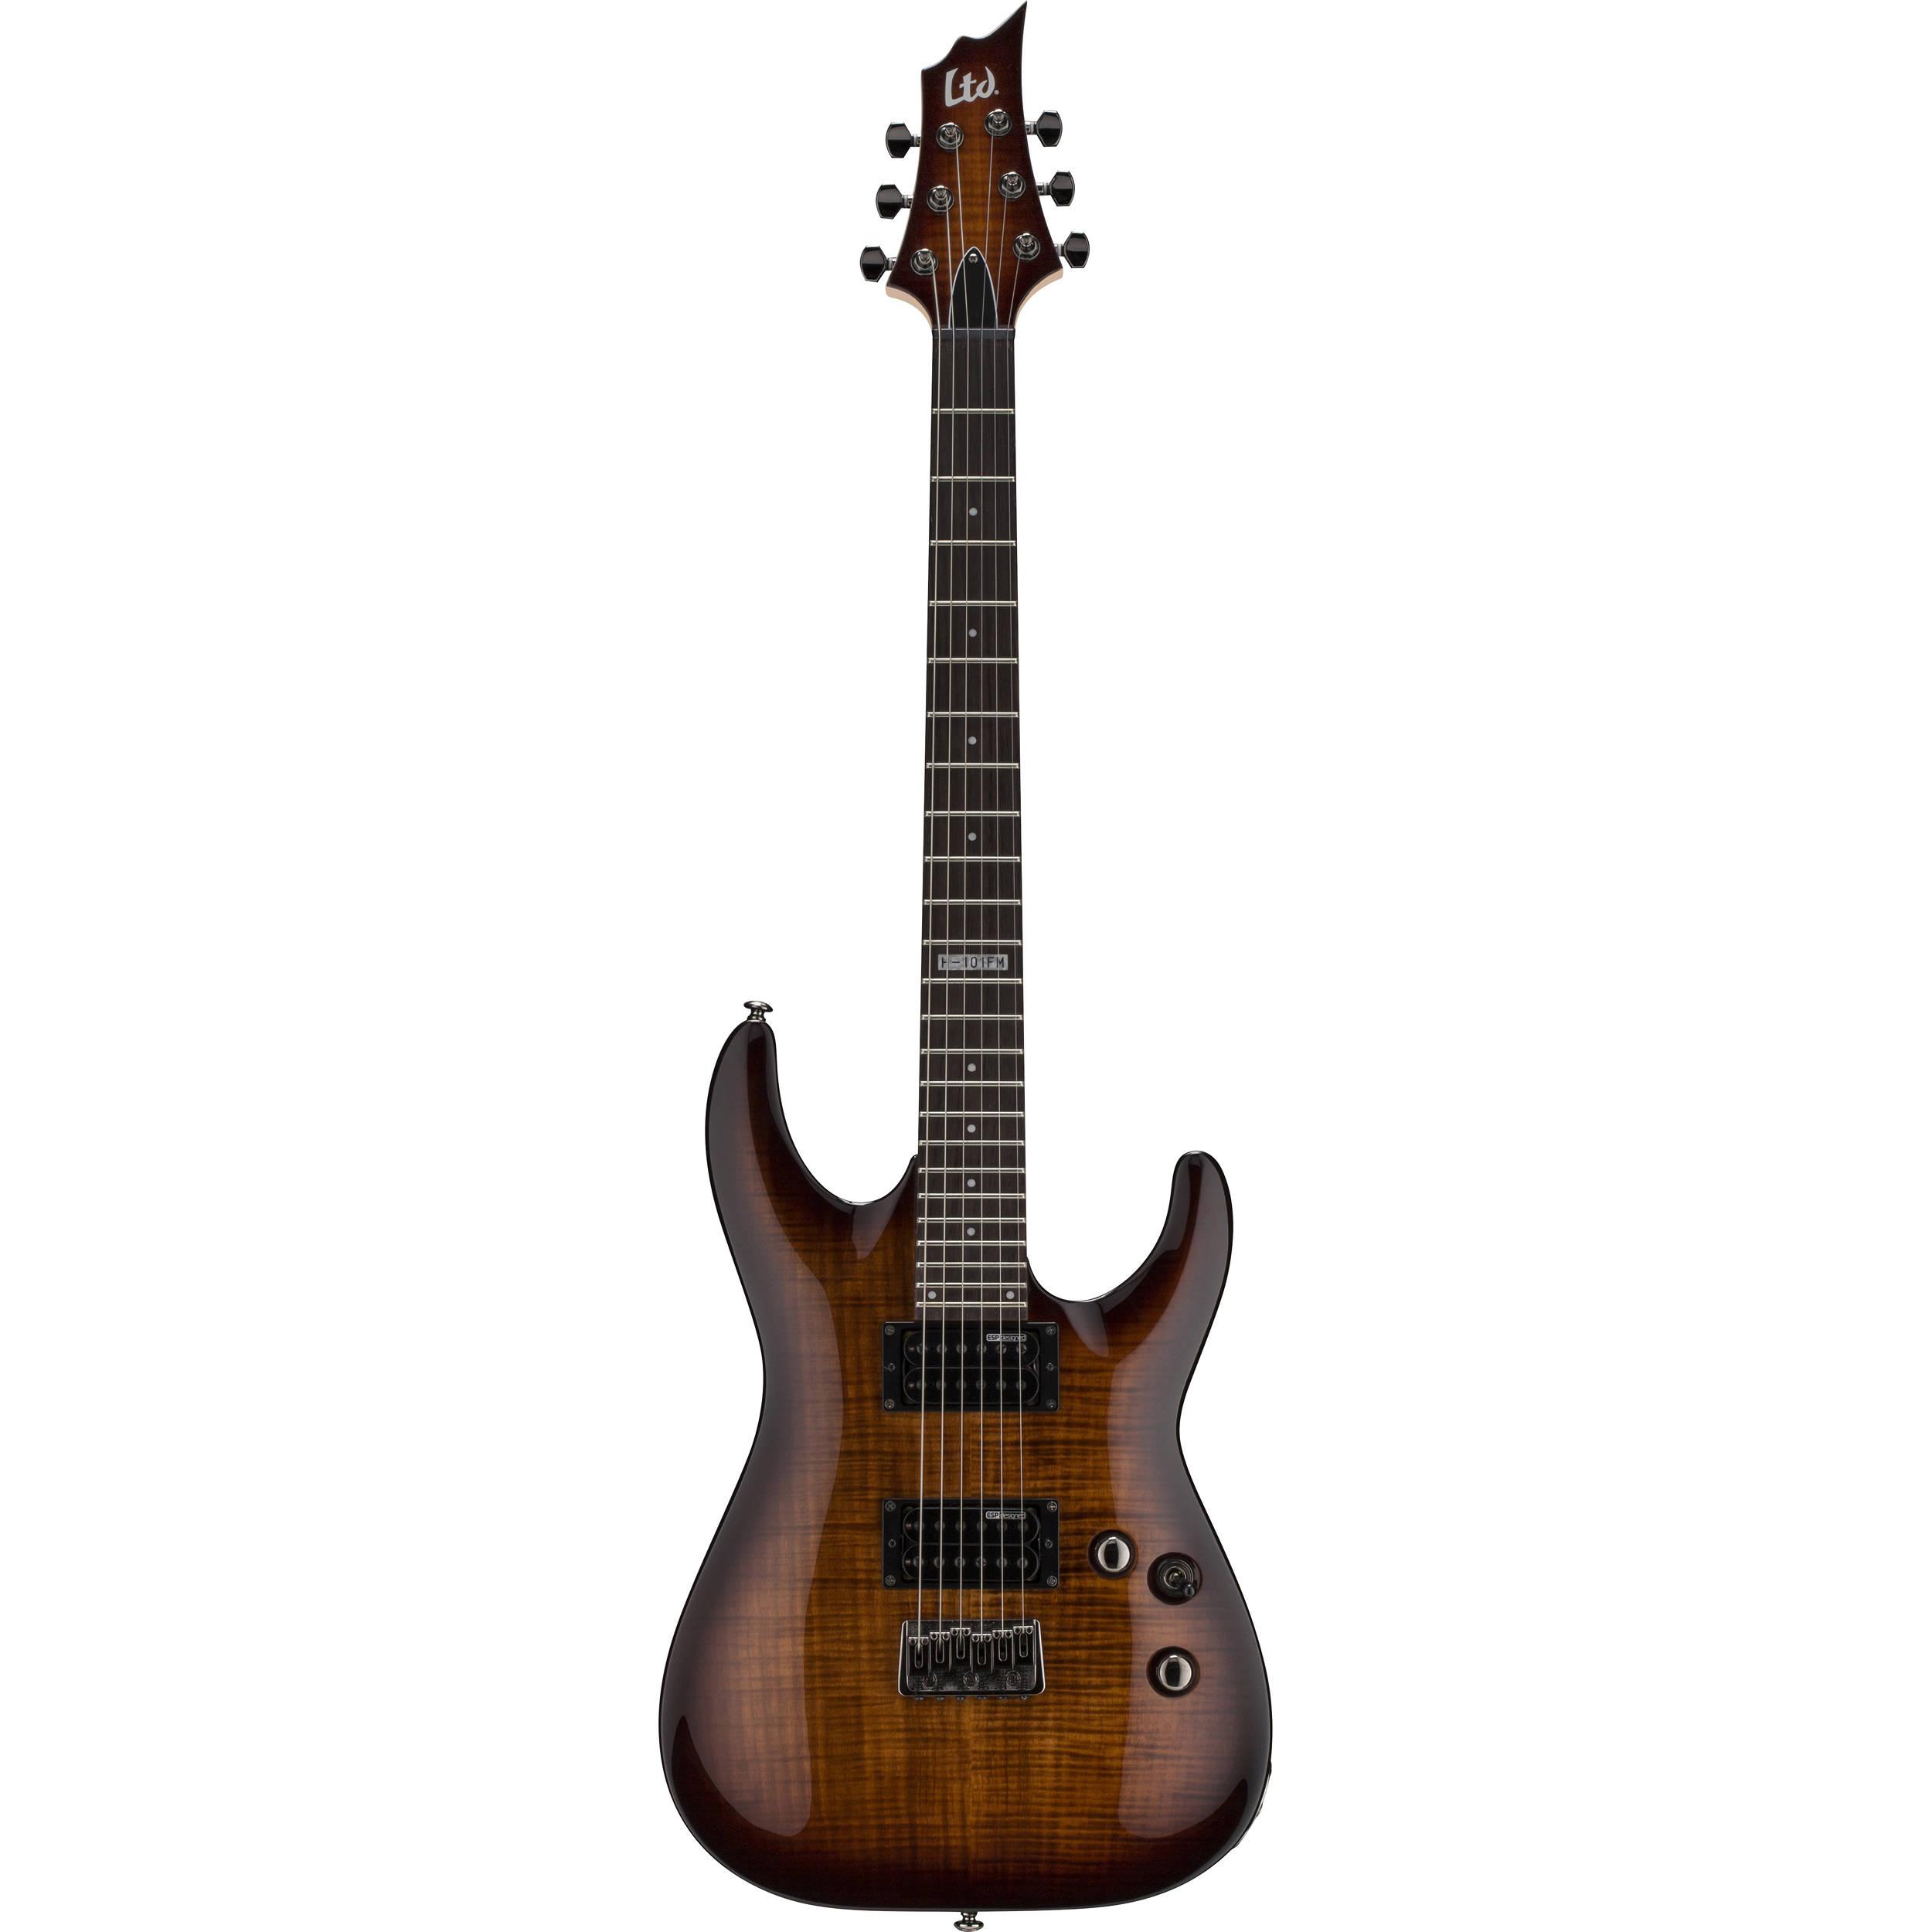 Used ESP LTD H-101FM Electric Guitar LH101FMDBSB B&H Photo Video